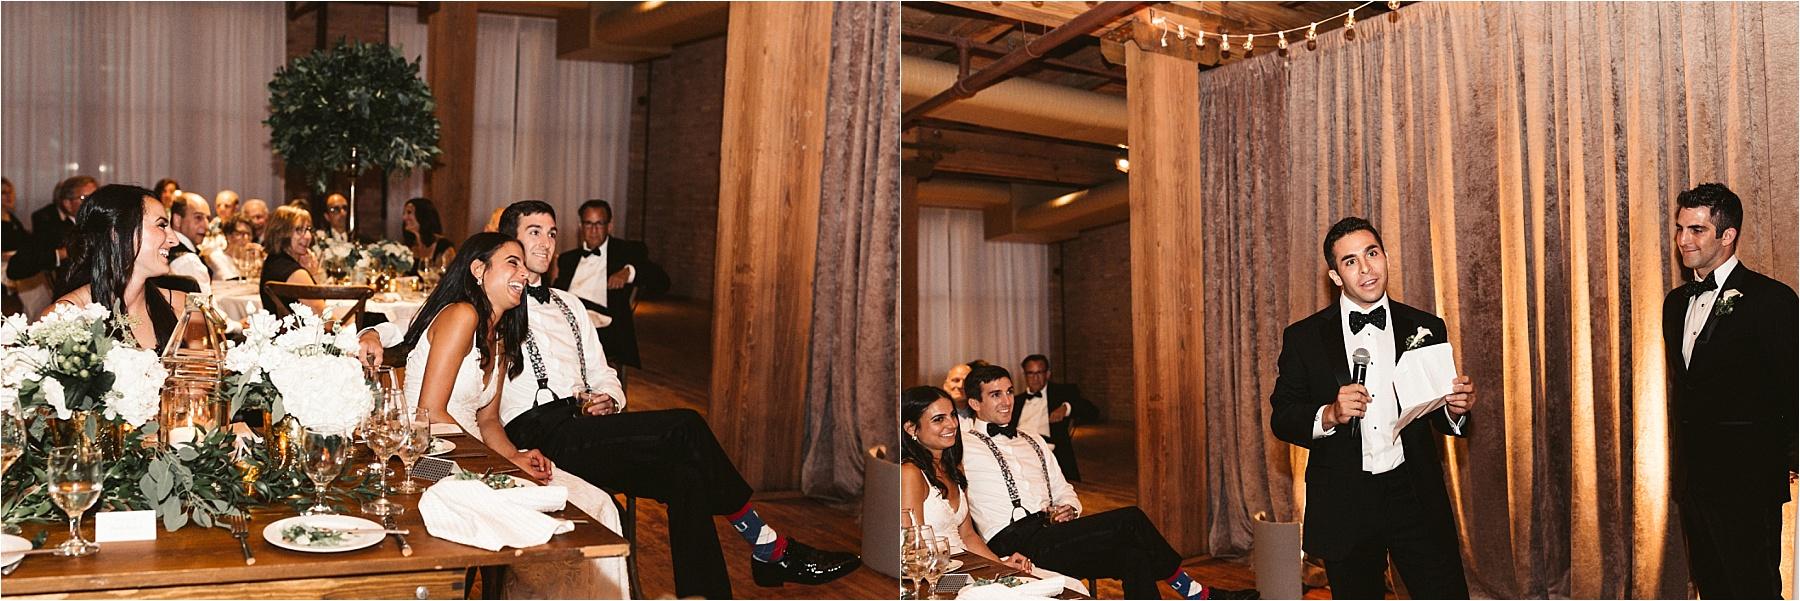 Bridgeport Art Center Wedding_0143.jpg